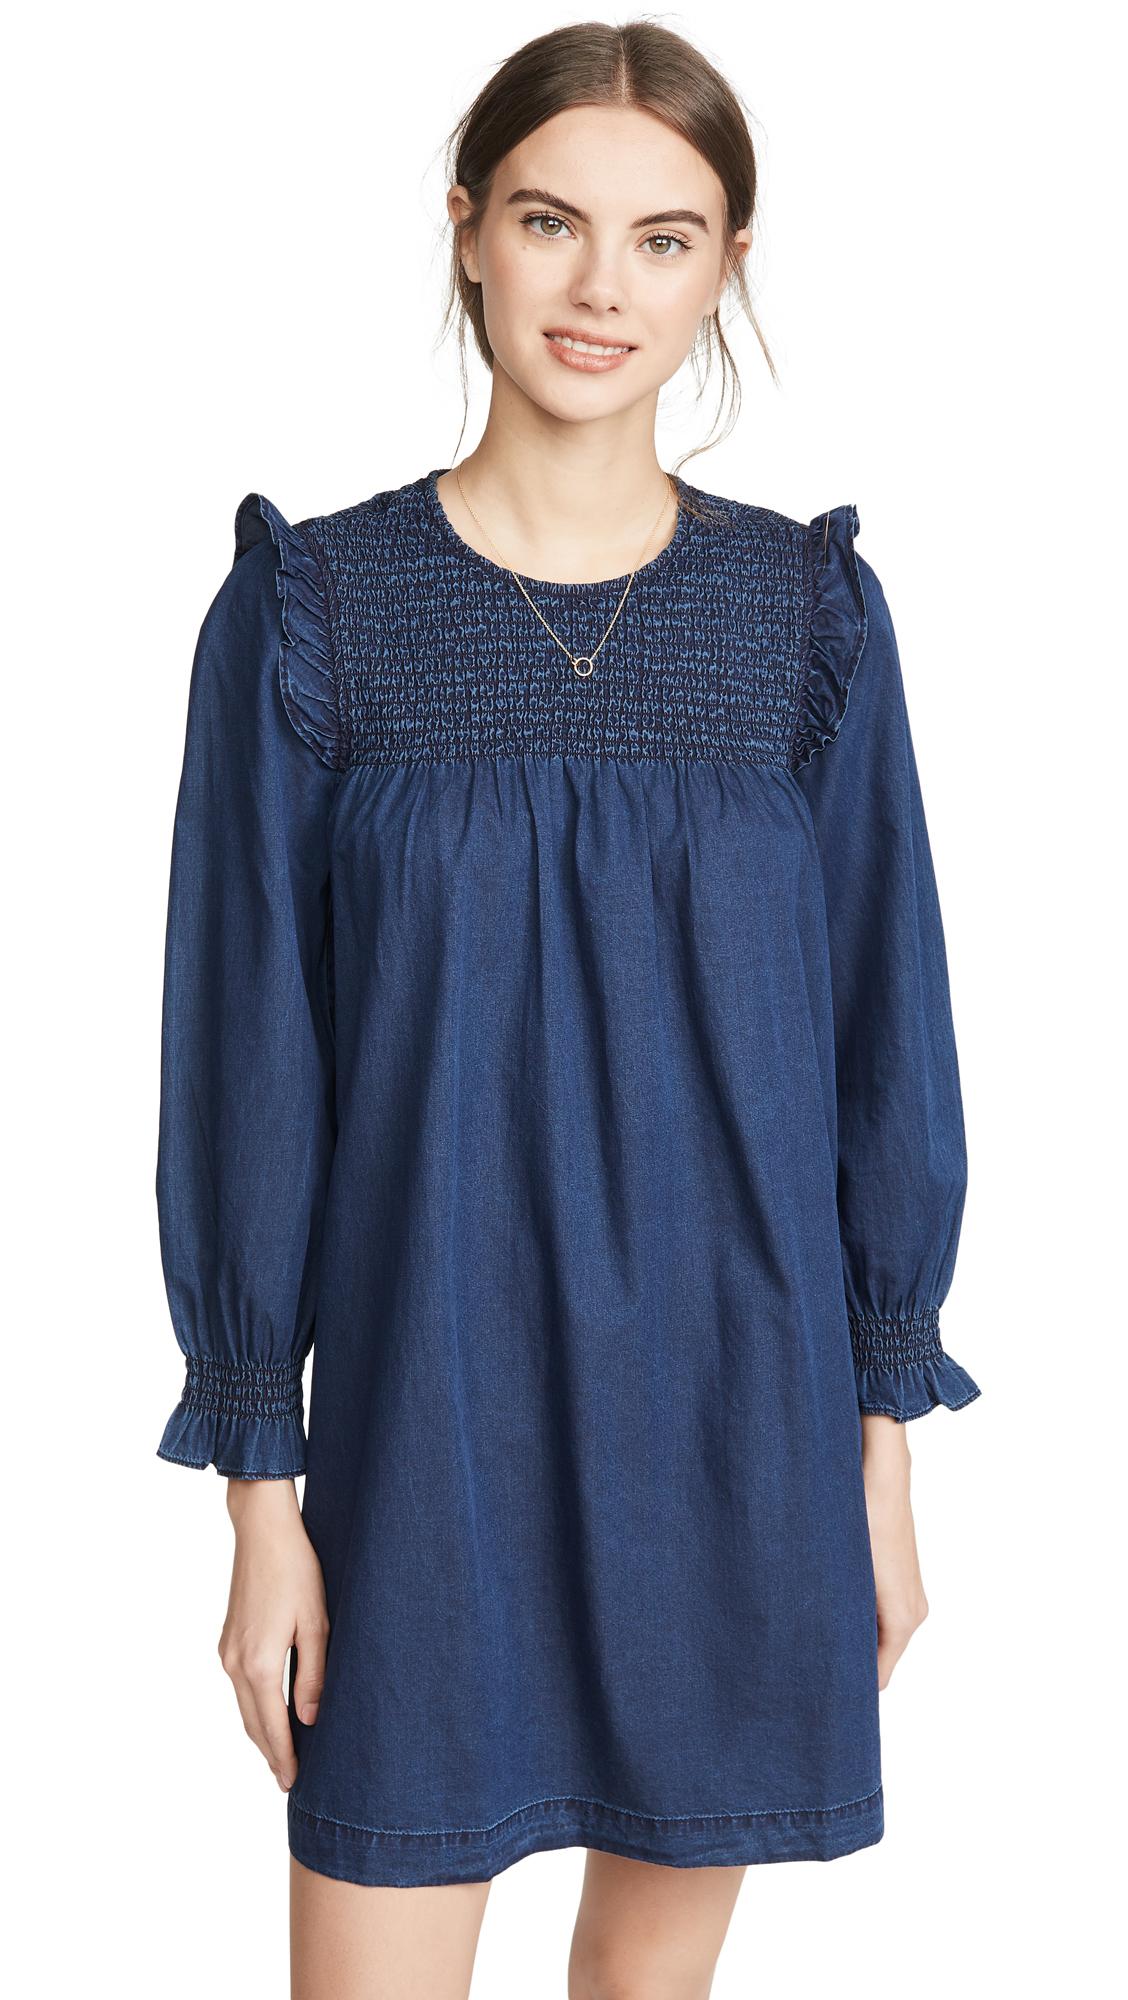 Madewell Indigo Ruffle Neck Smocked Babydoll Dress - 50% Off Sale